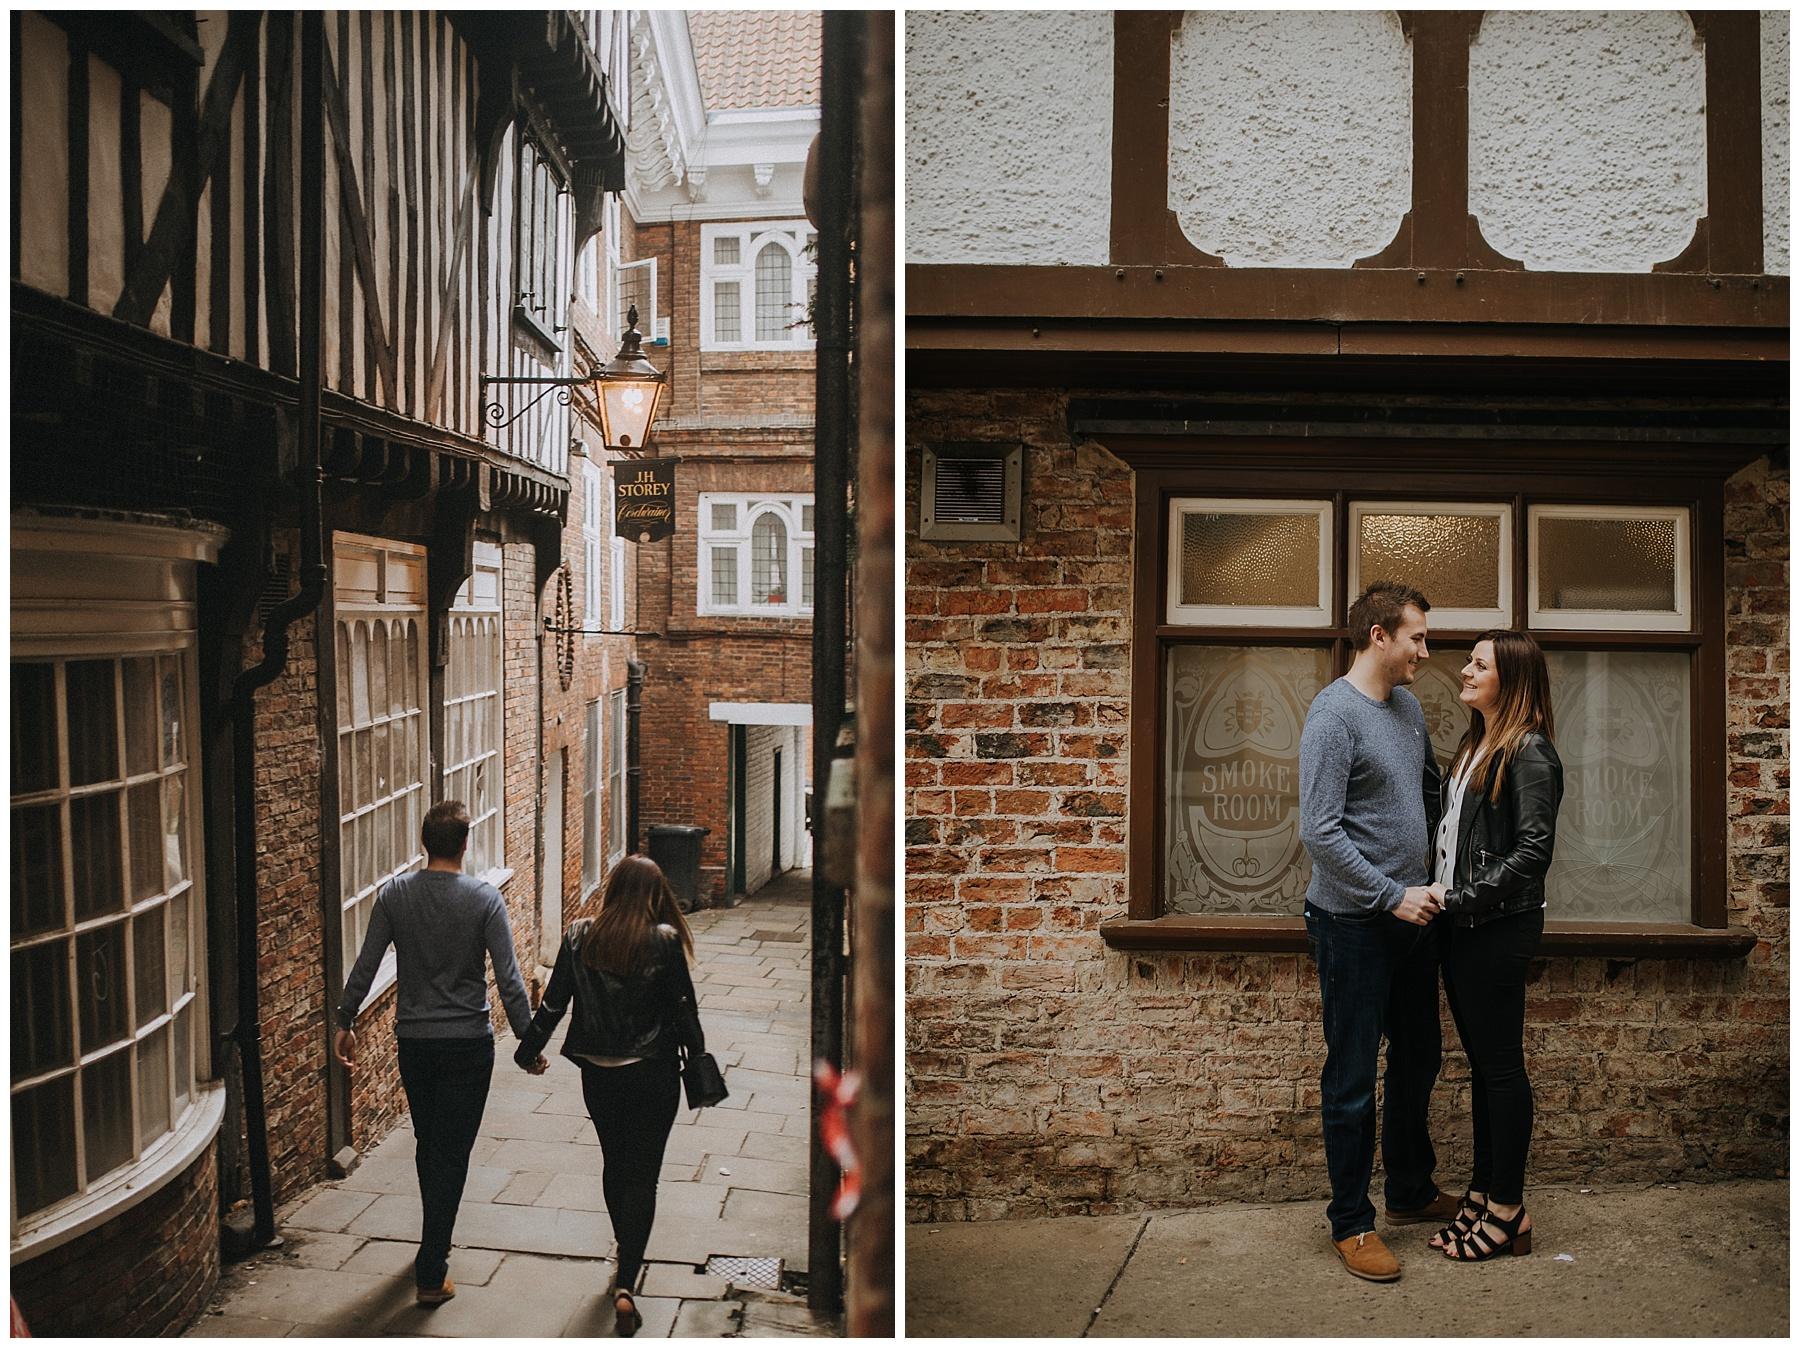 in front of York's pub windows